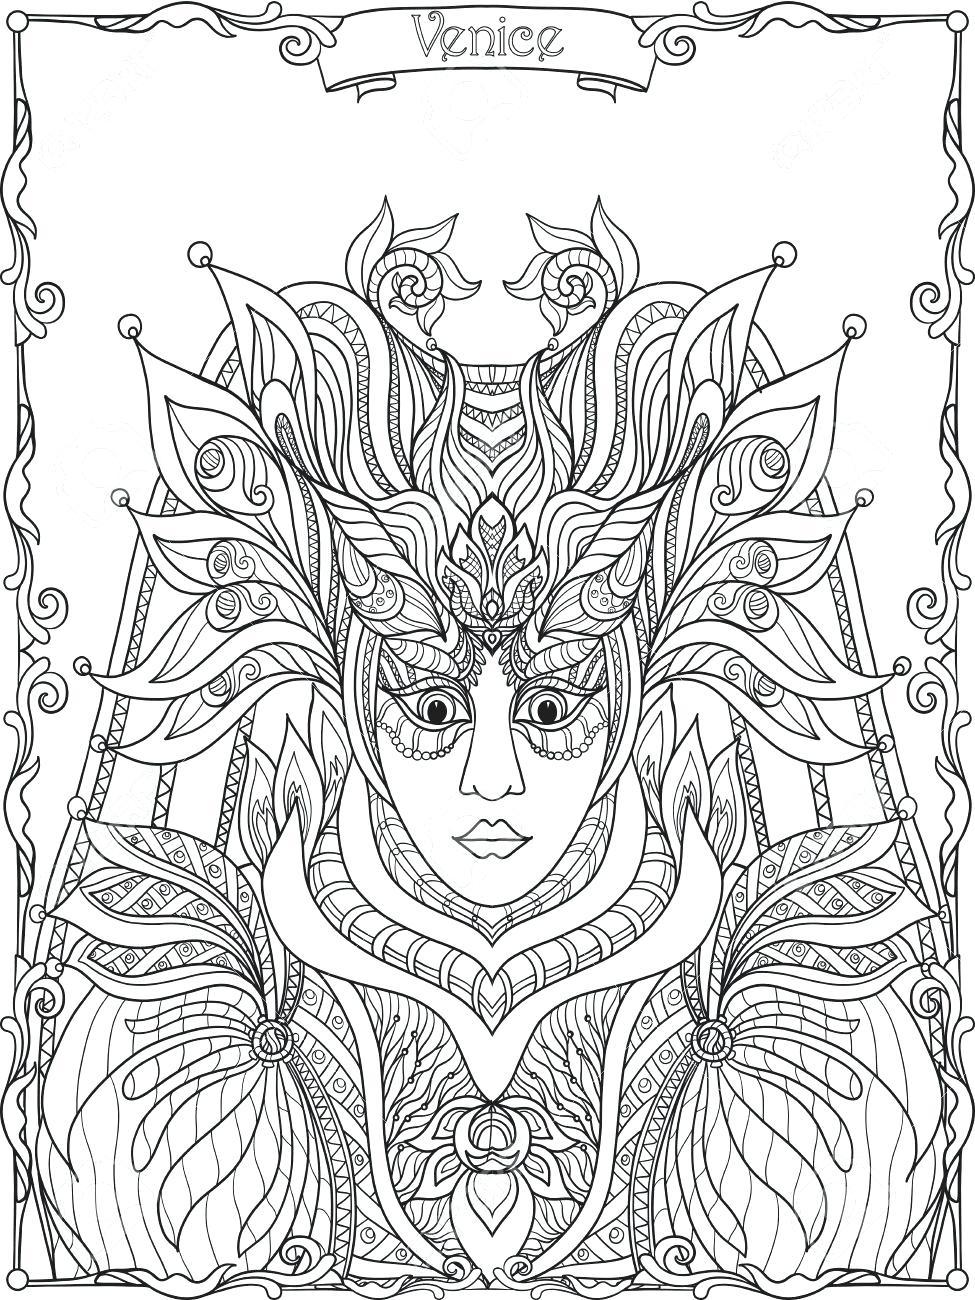 975x1300 Coloring Masquerade Masks Coloring Pages Animal Mask Ball